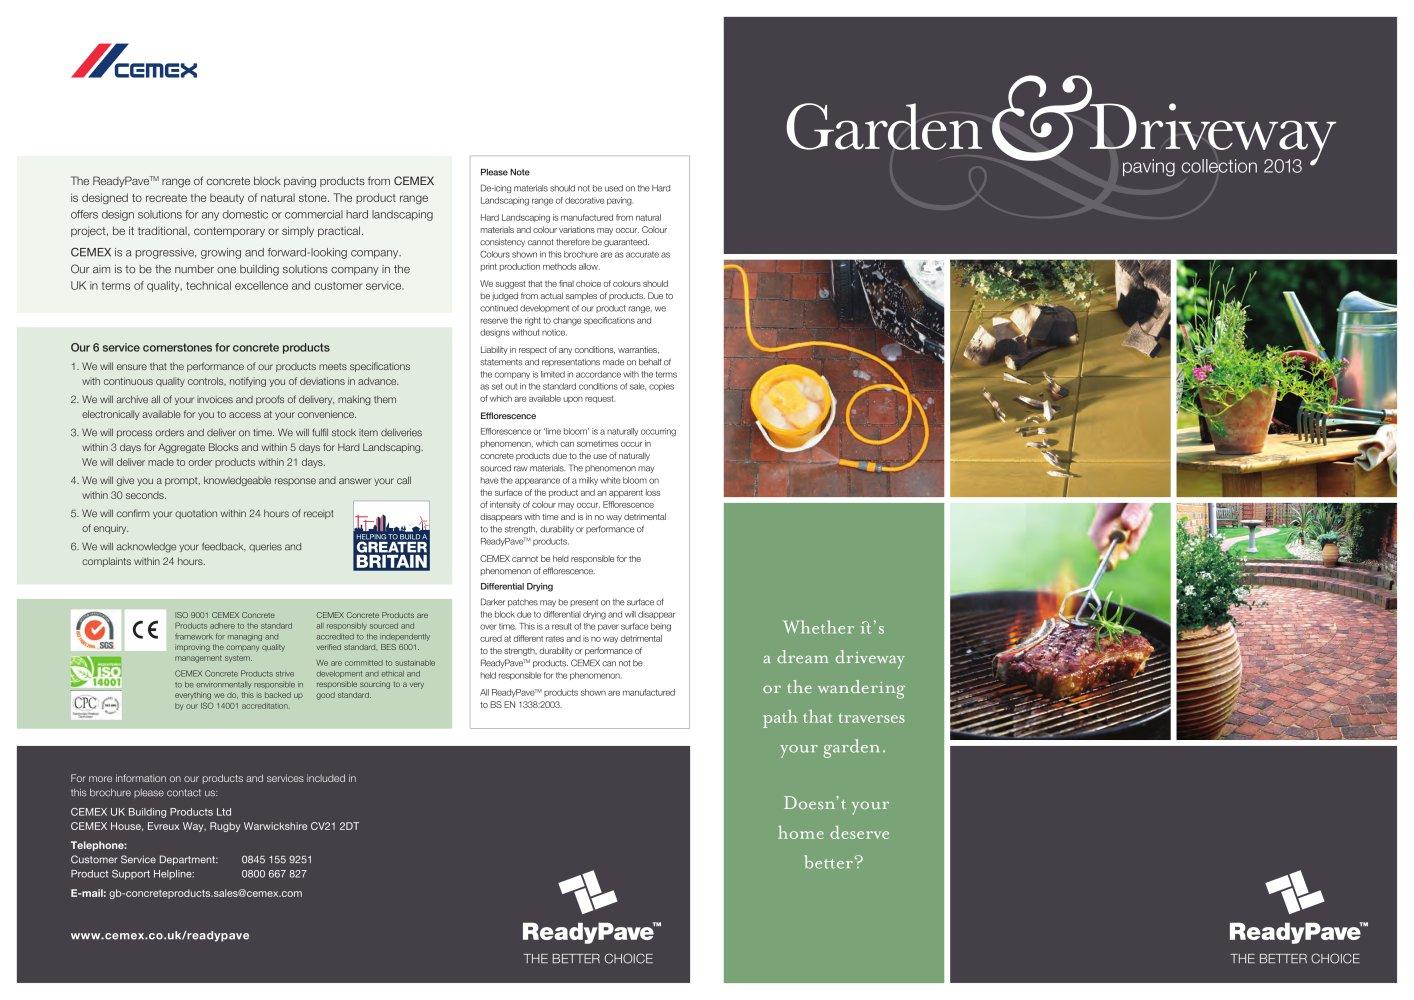 GARDEN AND DRIVEWAYS 2013 Cemex PDF Catalogues Documentation